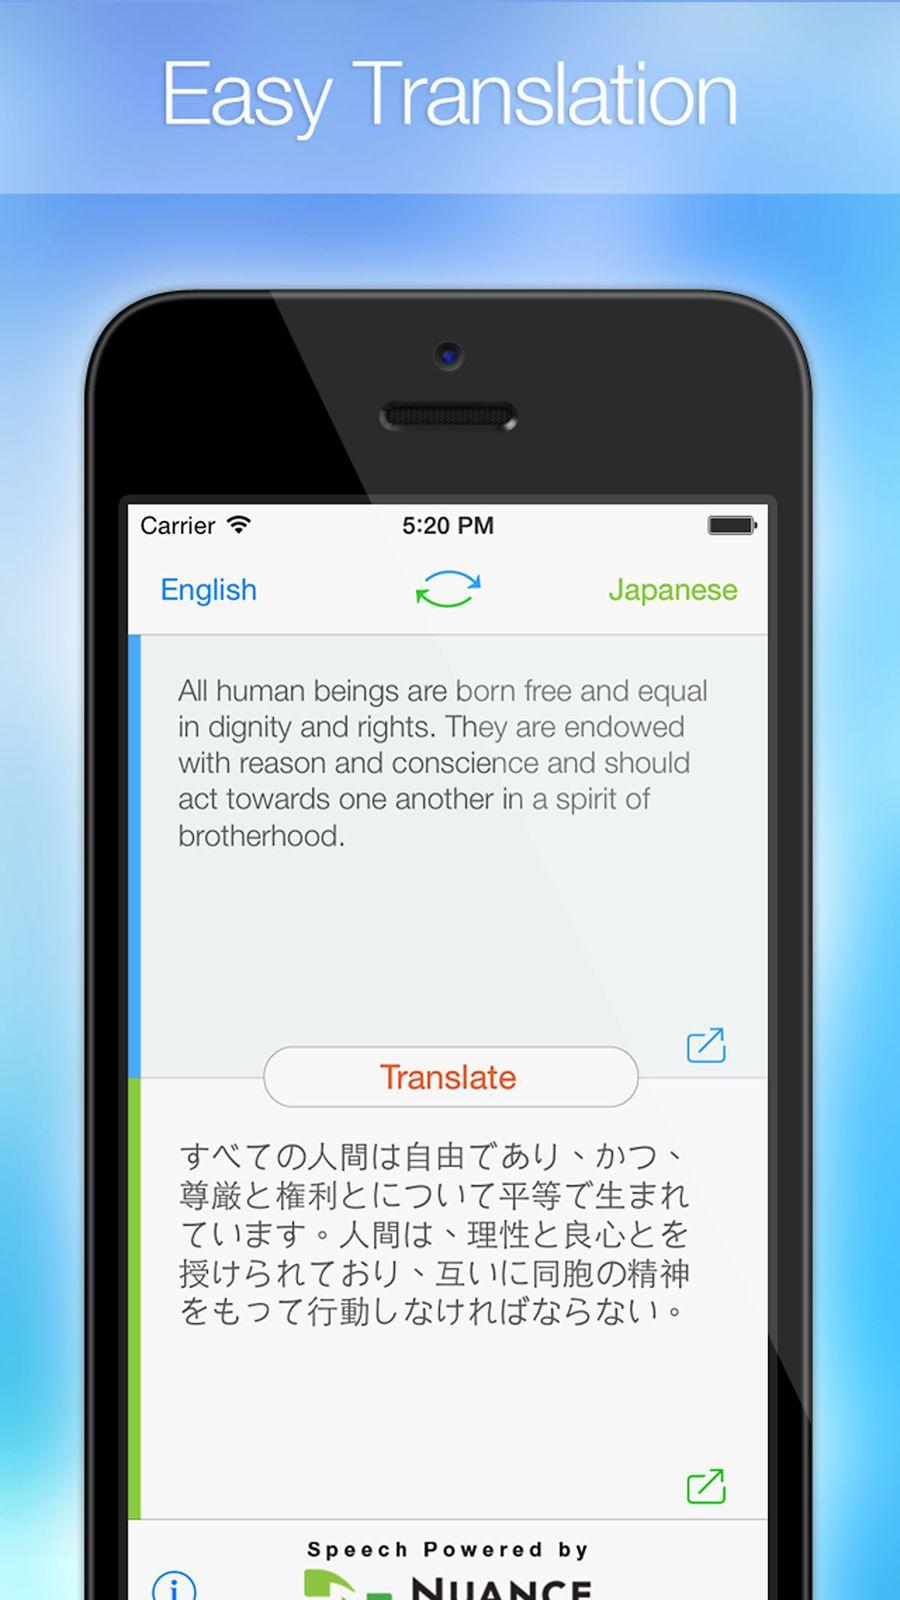 Easy Translation (Free) ReferenceLimitediosEducation